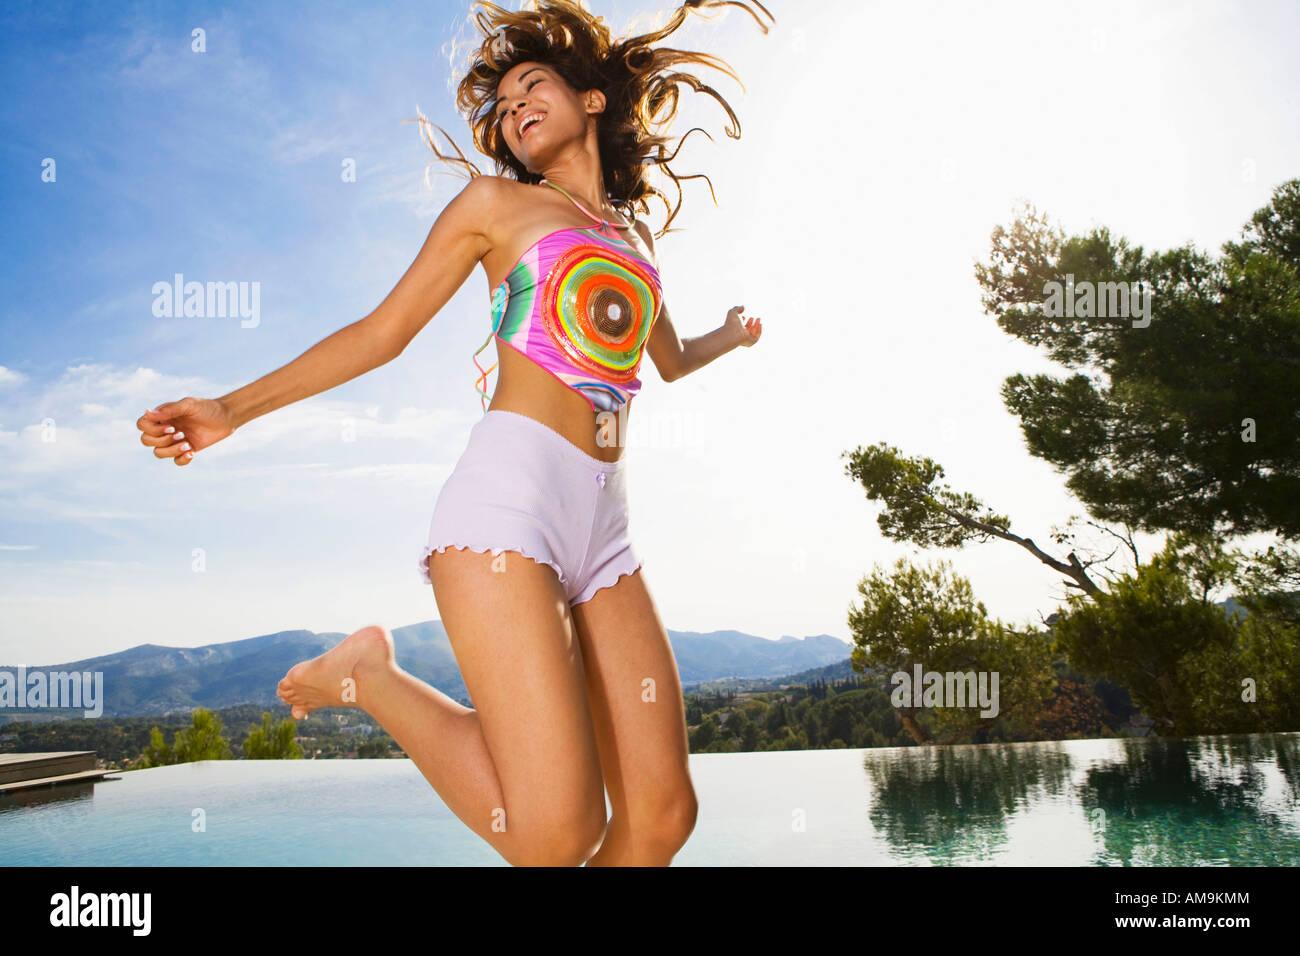 Frau in der Nähe einer Inifinity Pool lächelnd springen. Stockbild